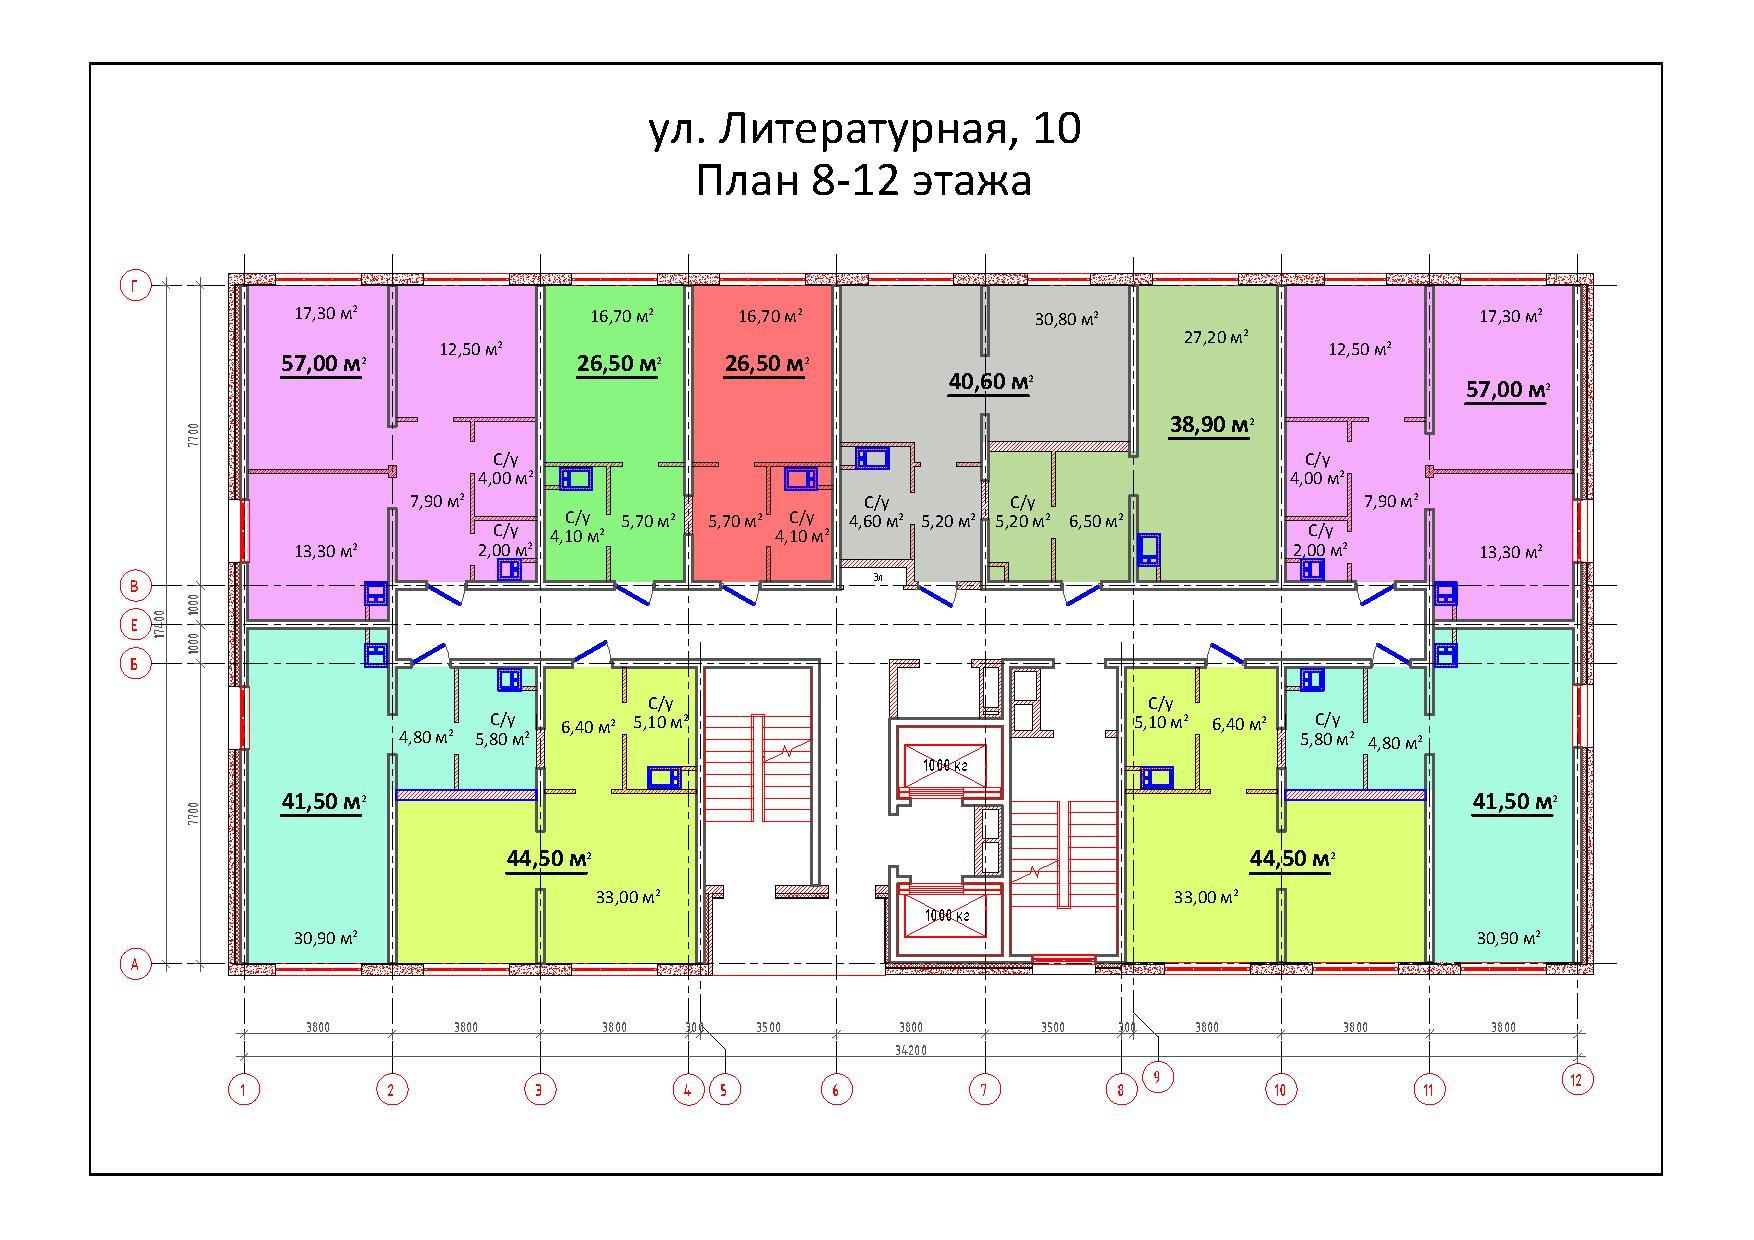 Апарт- комплекс Литературный План 8-12 этажа